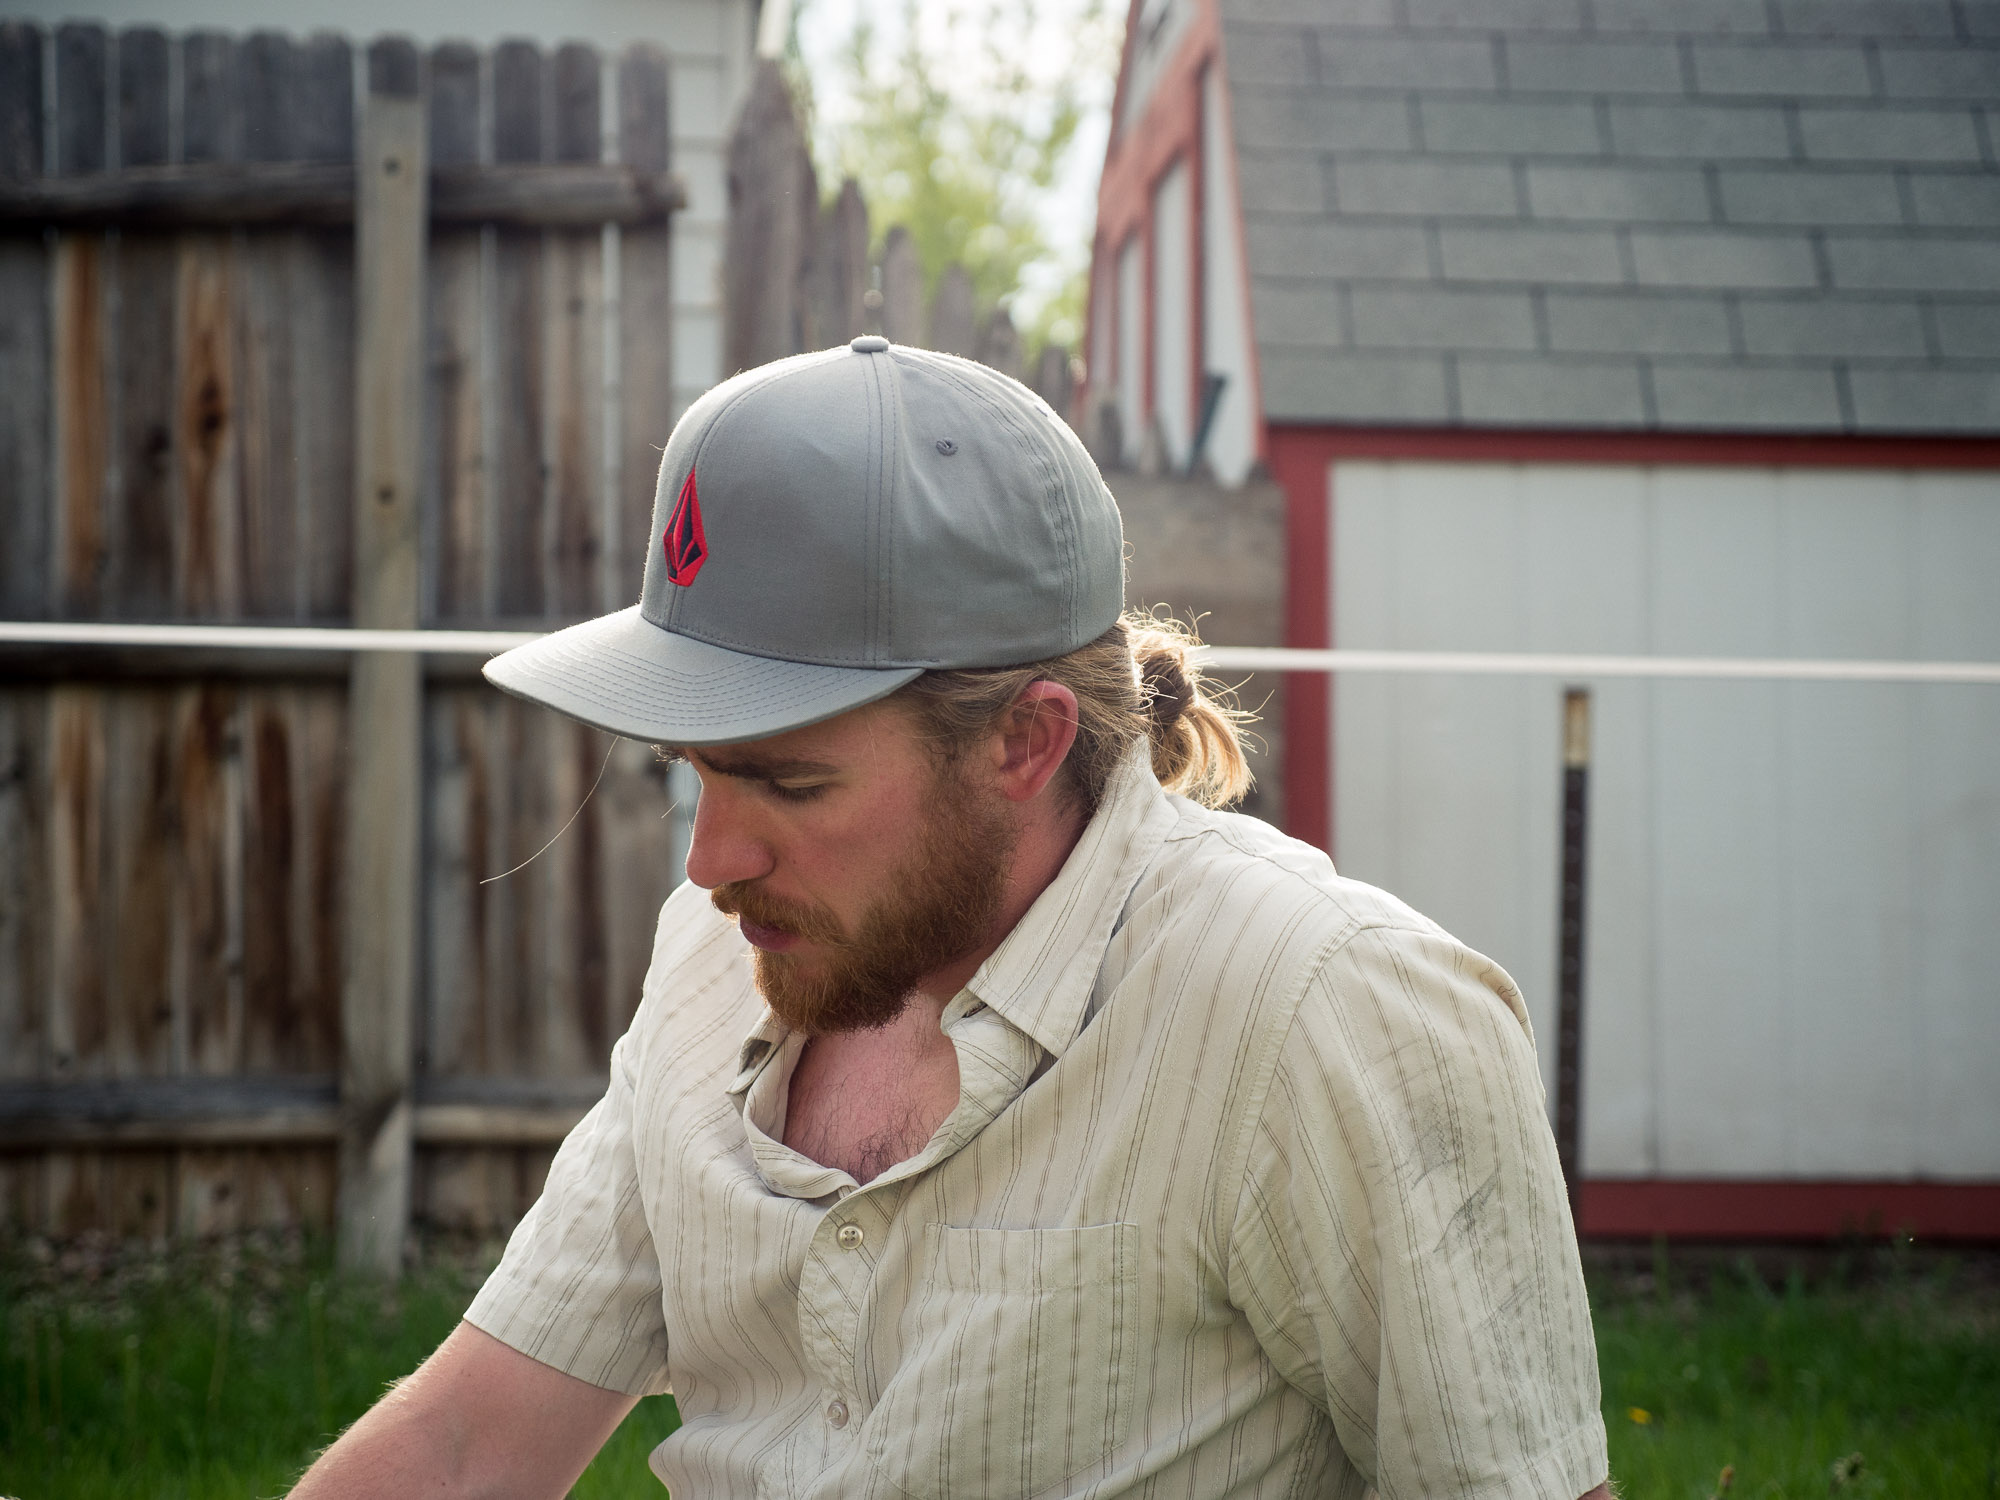 KH in the backyard